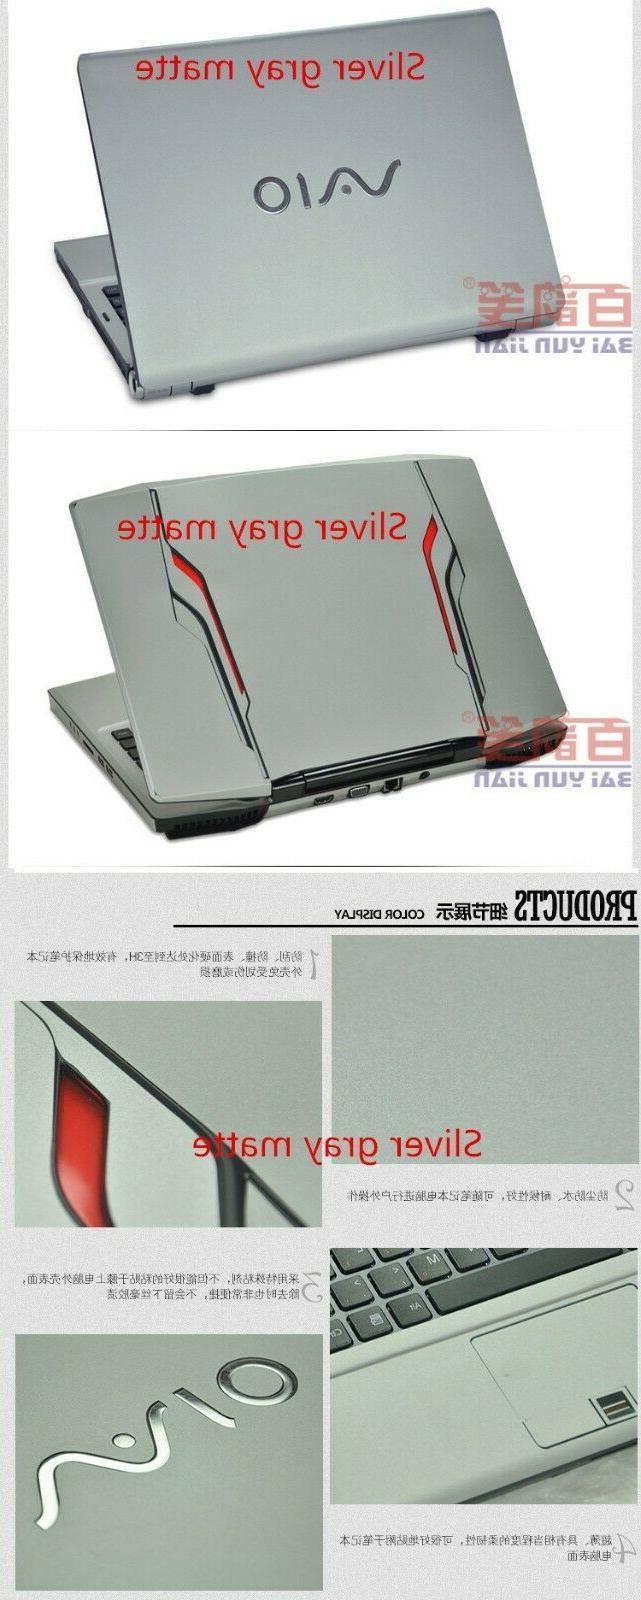 Laptop Vinyl Sticker ThinkPad Yoga 4th Gen